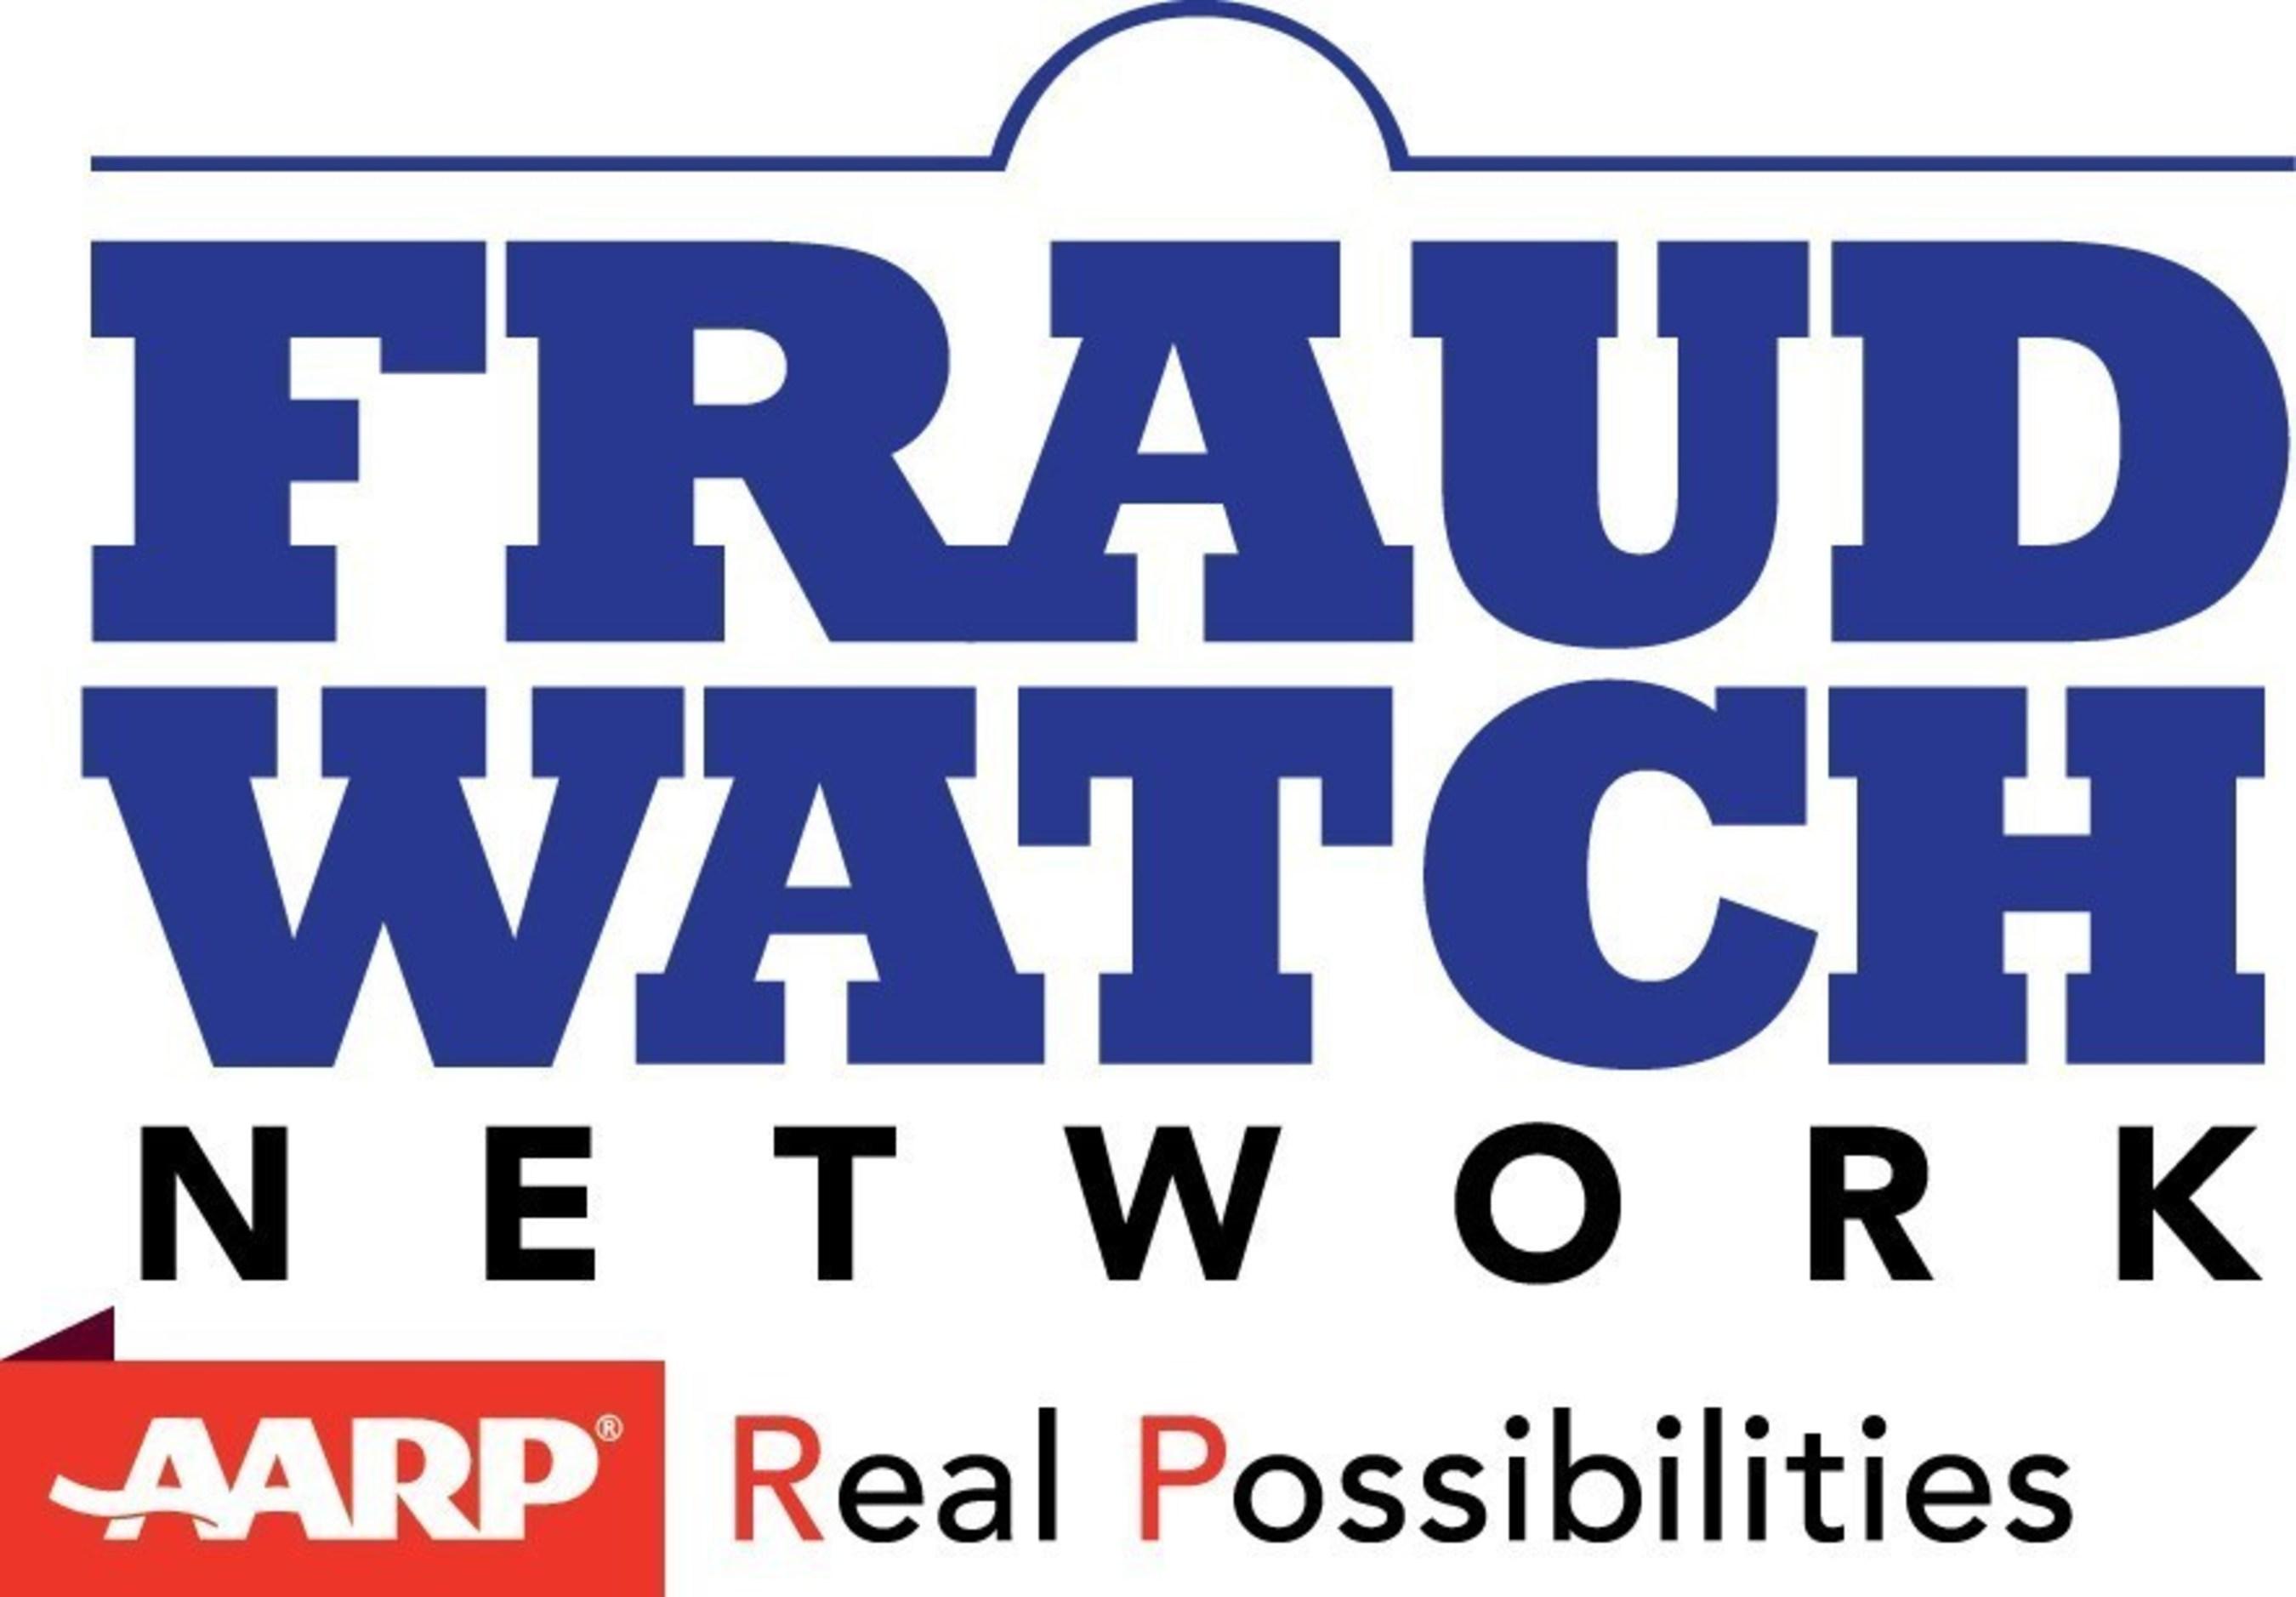 AARP_Fraud_Watch_Network_Logo